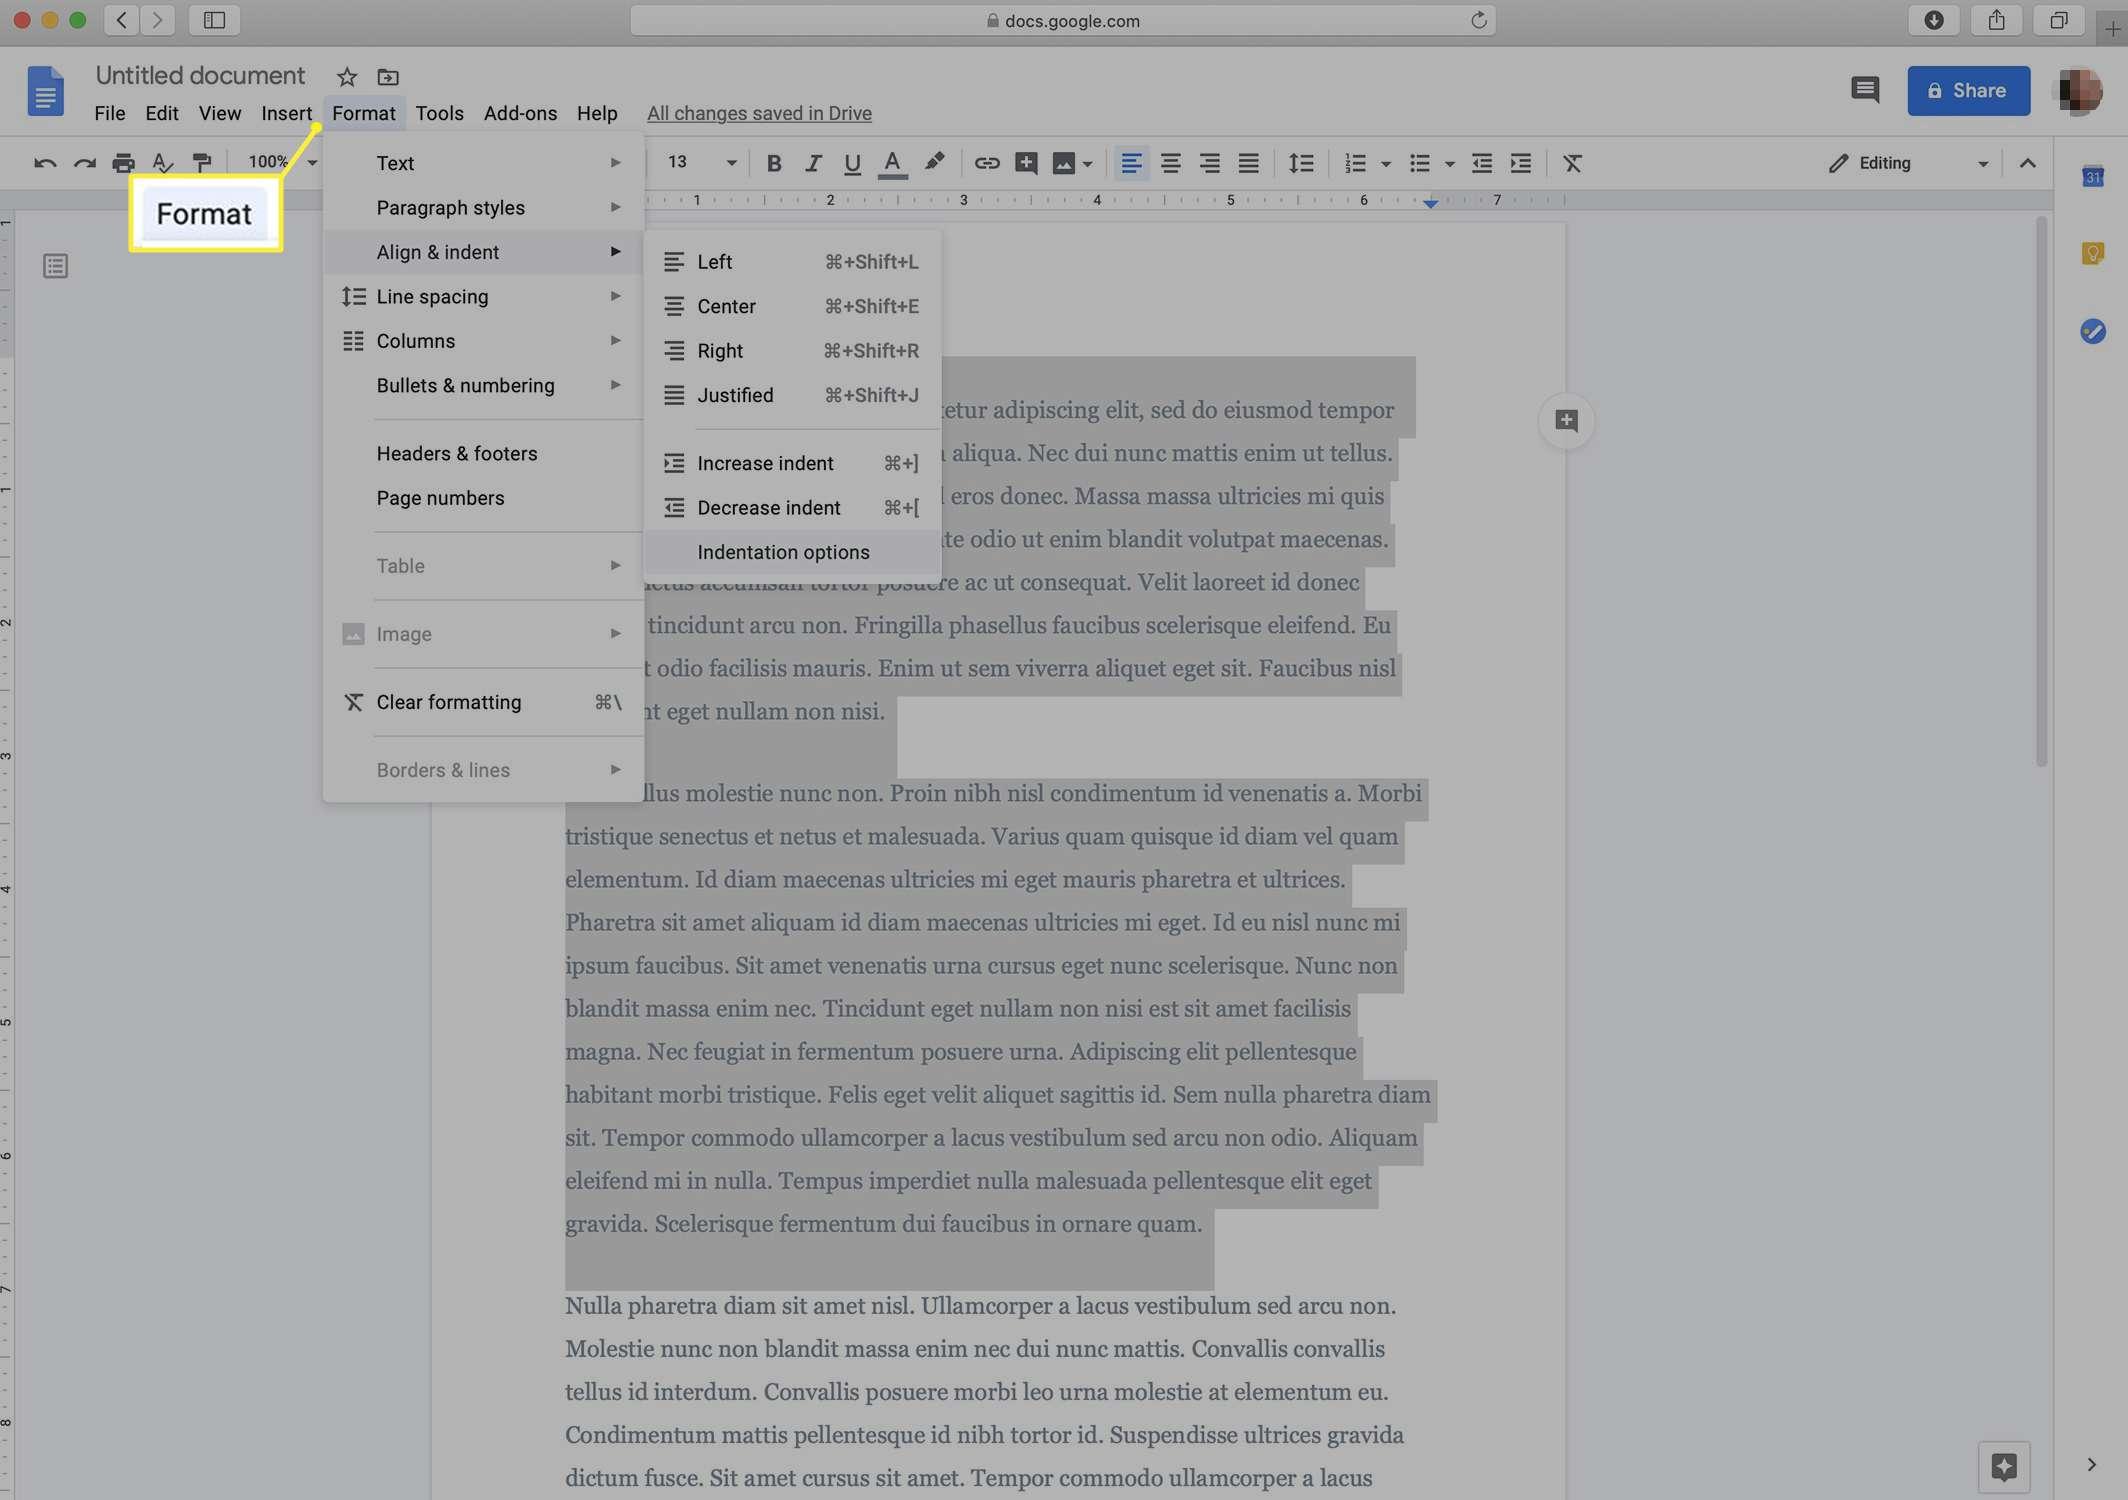 Google Docs formatting menu